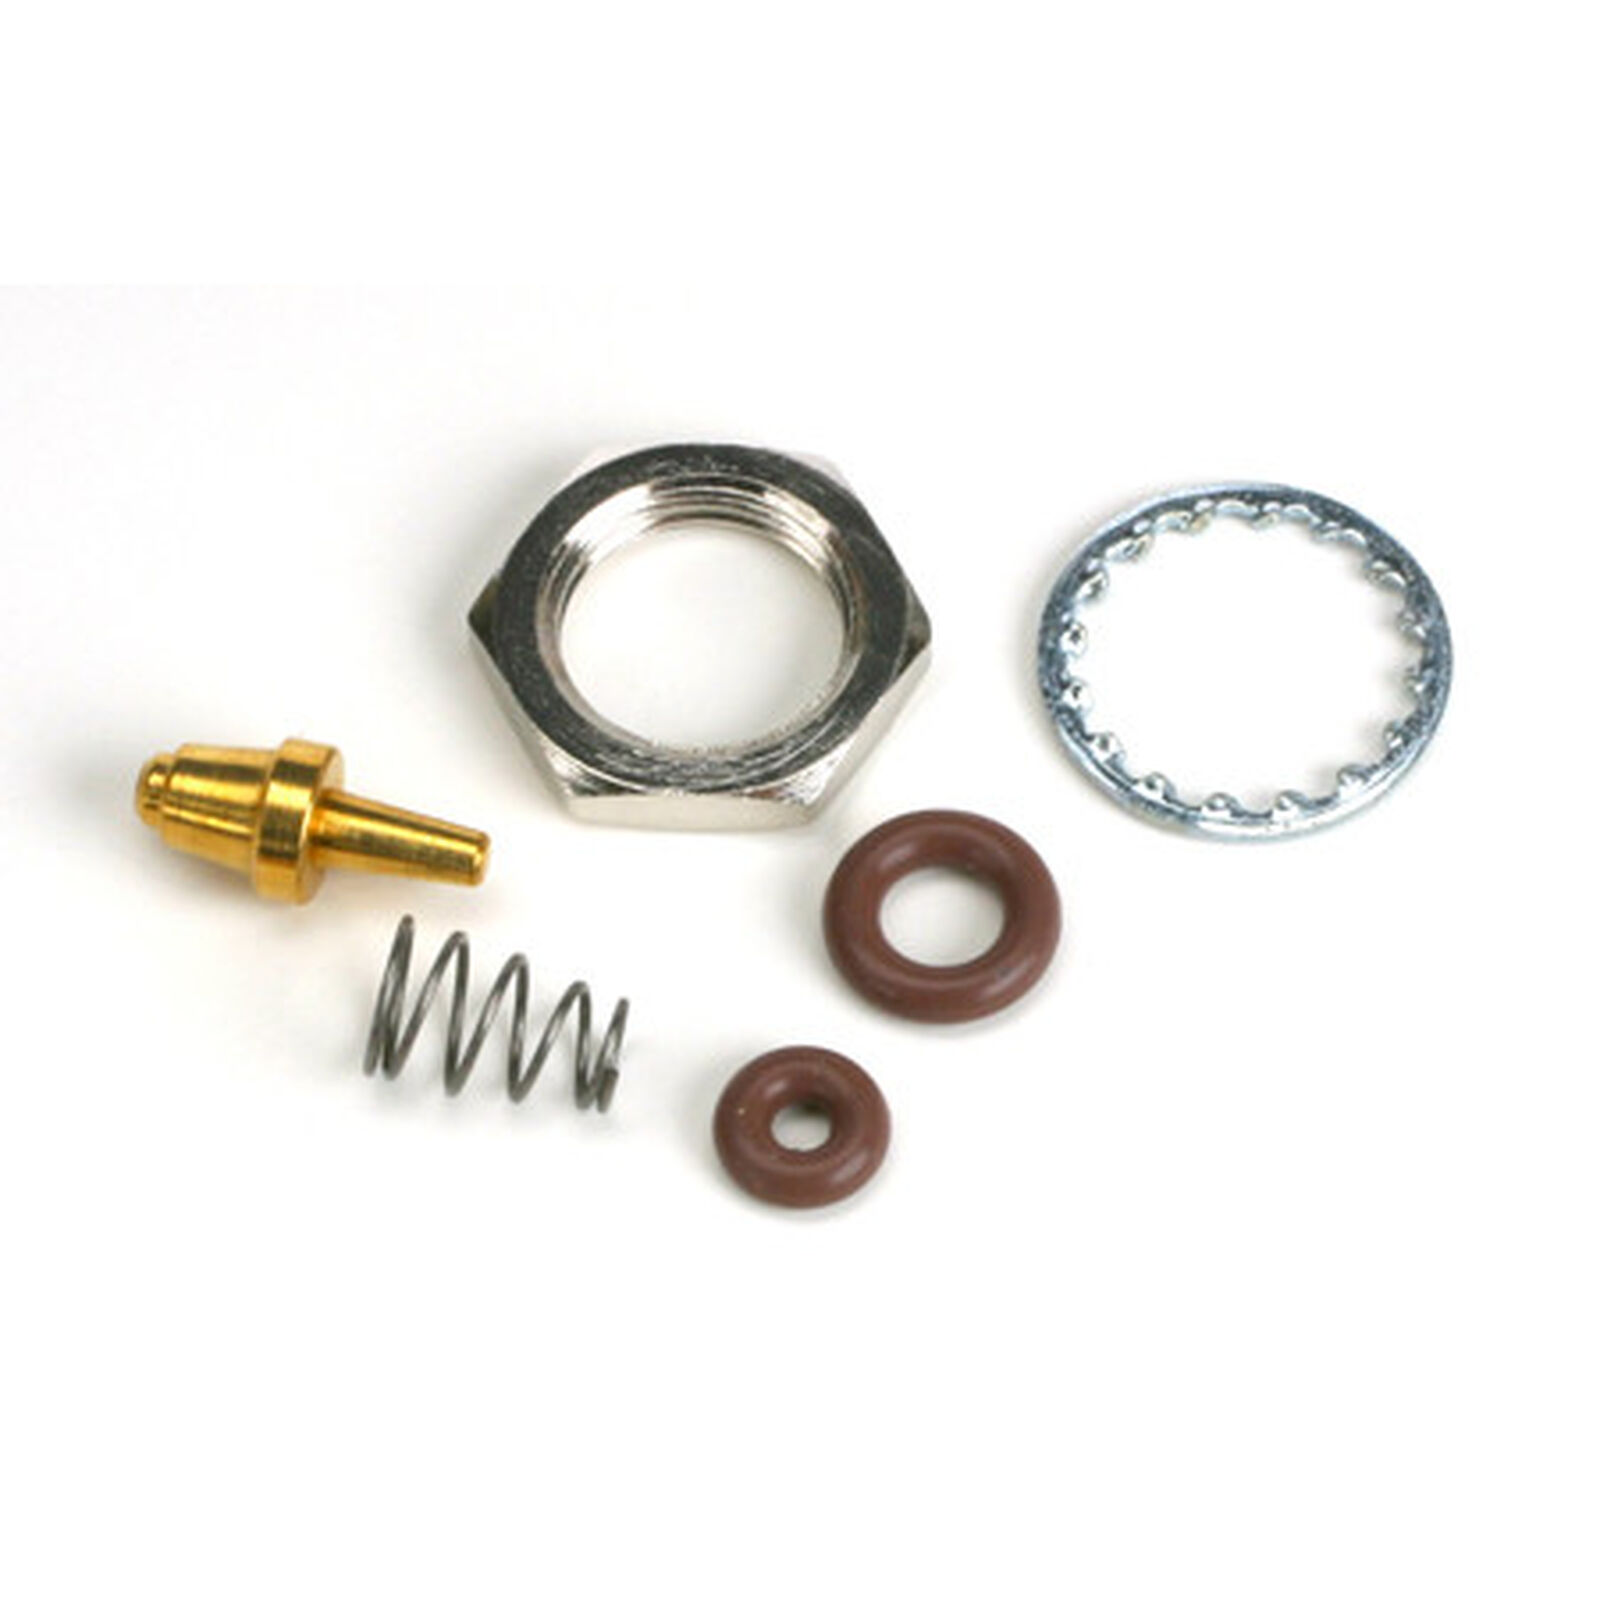 Rebuild Kit: 335 Fuel Valve